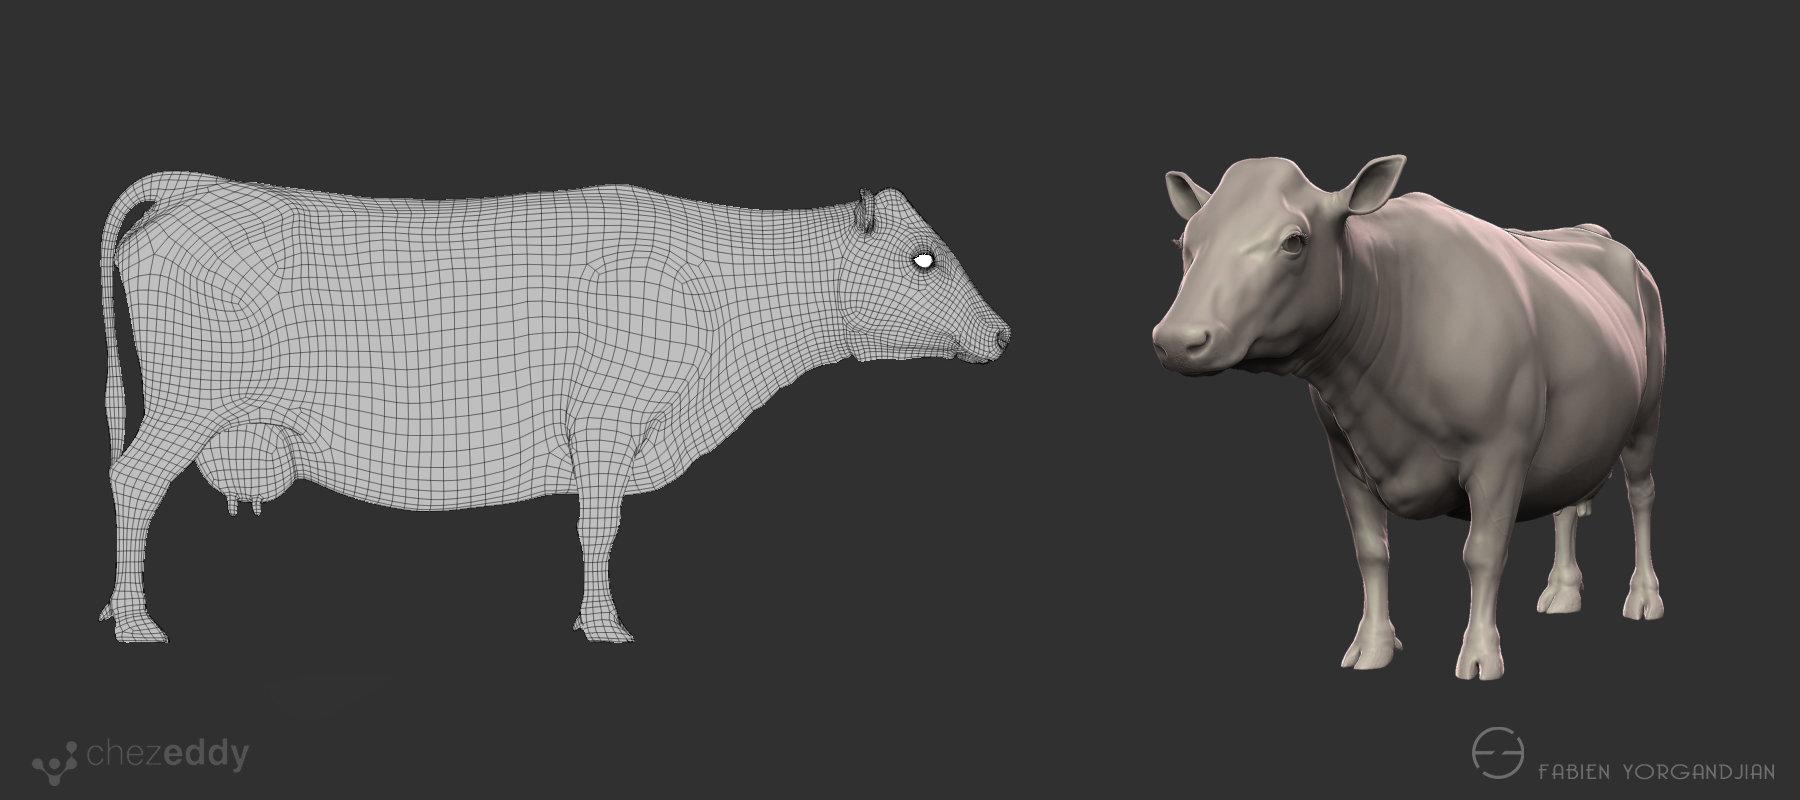 Fabien yorgandjian cow 02